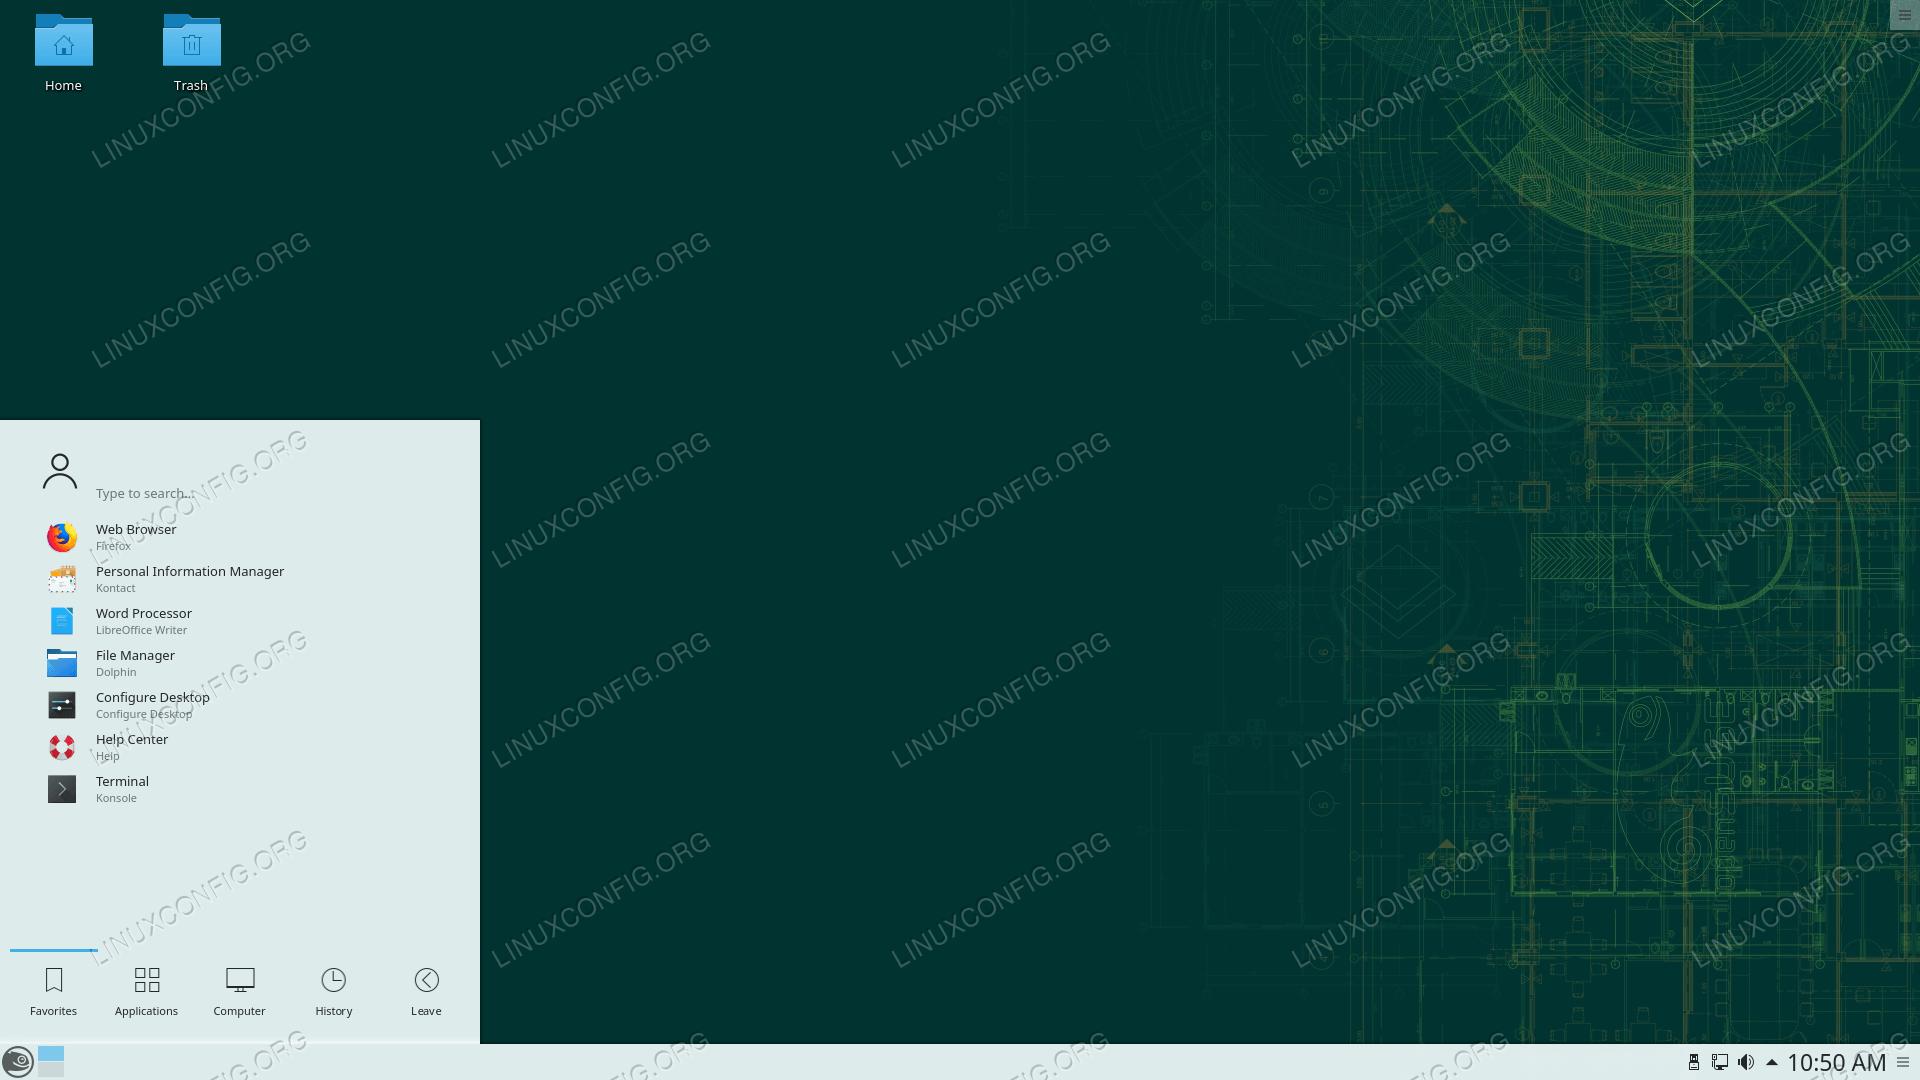 OpenSUSE running KDE Plasma desktop environment